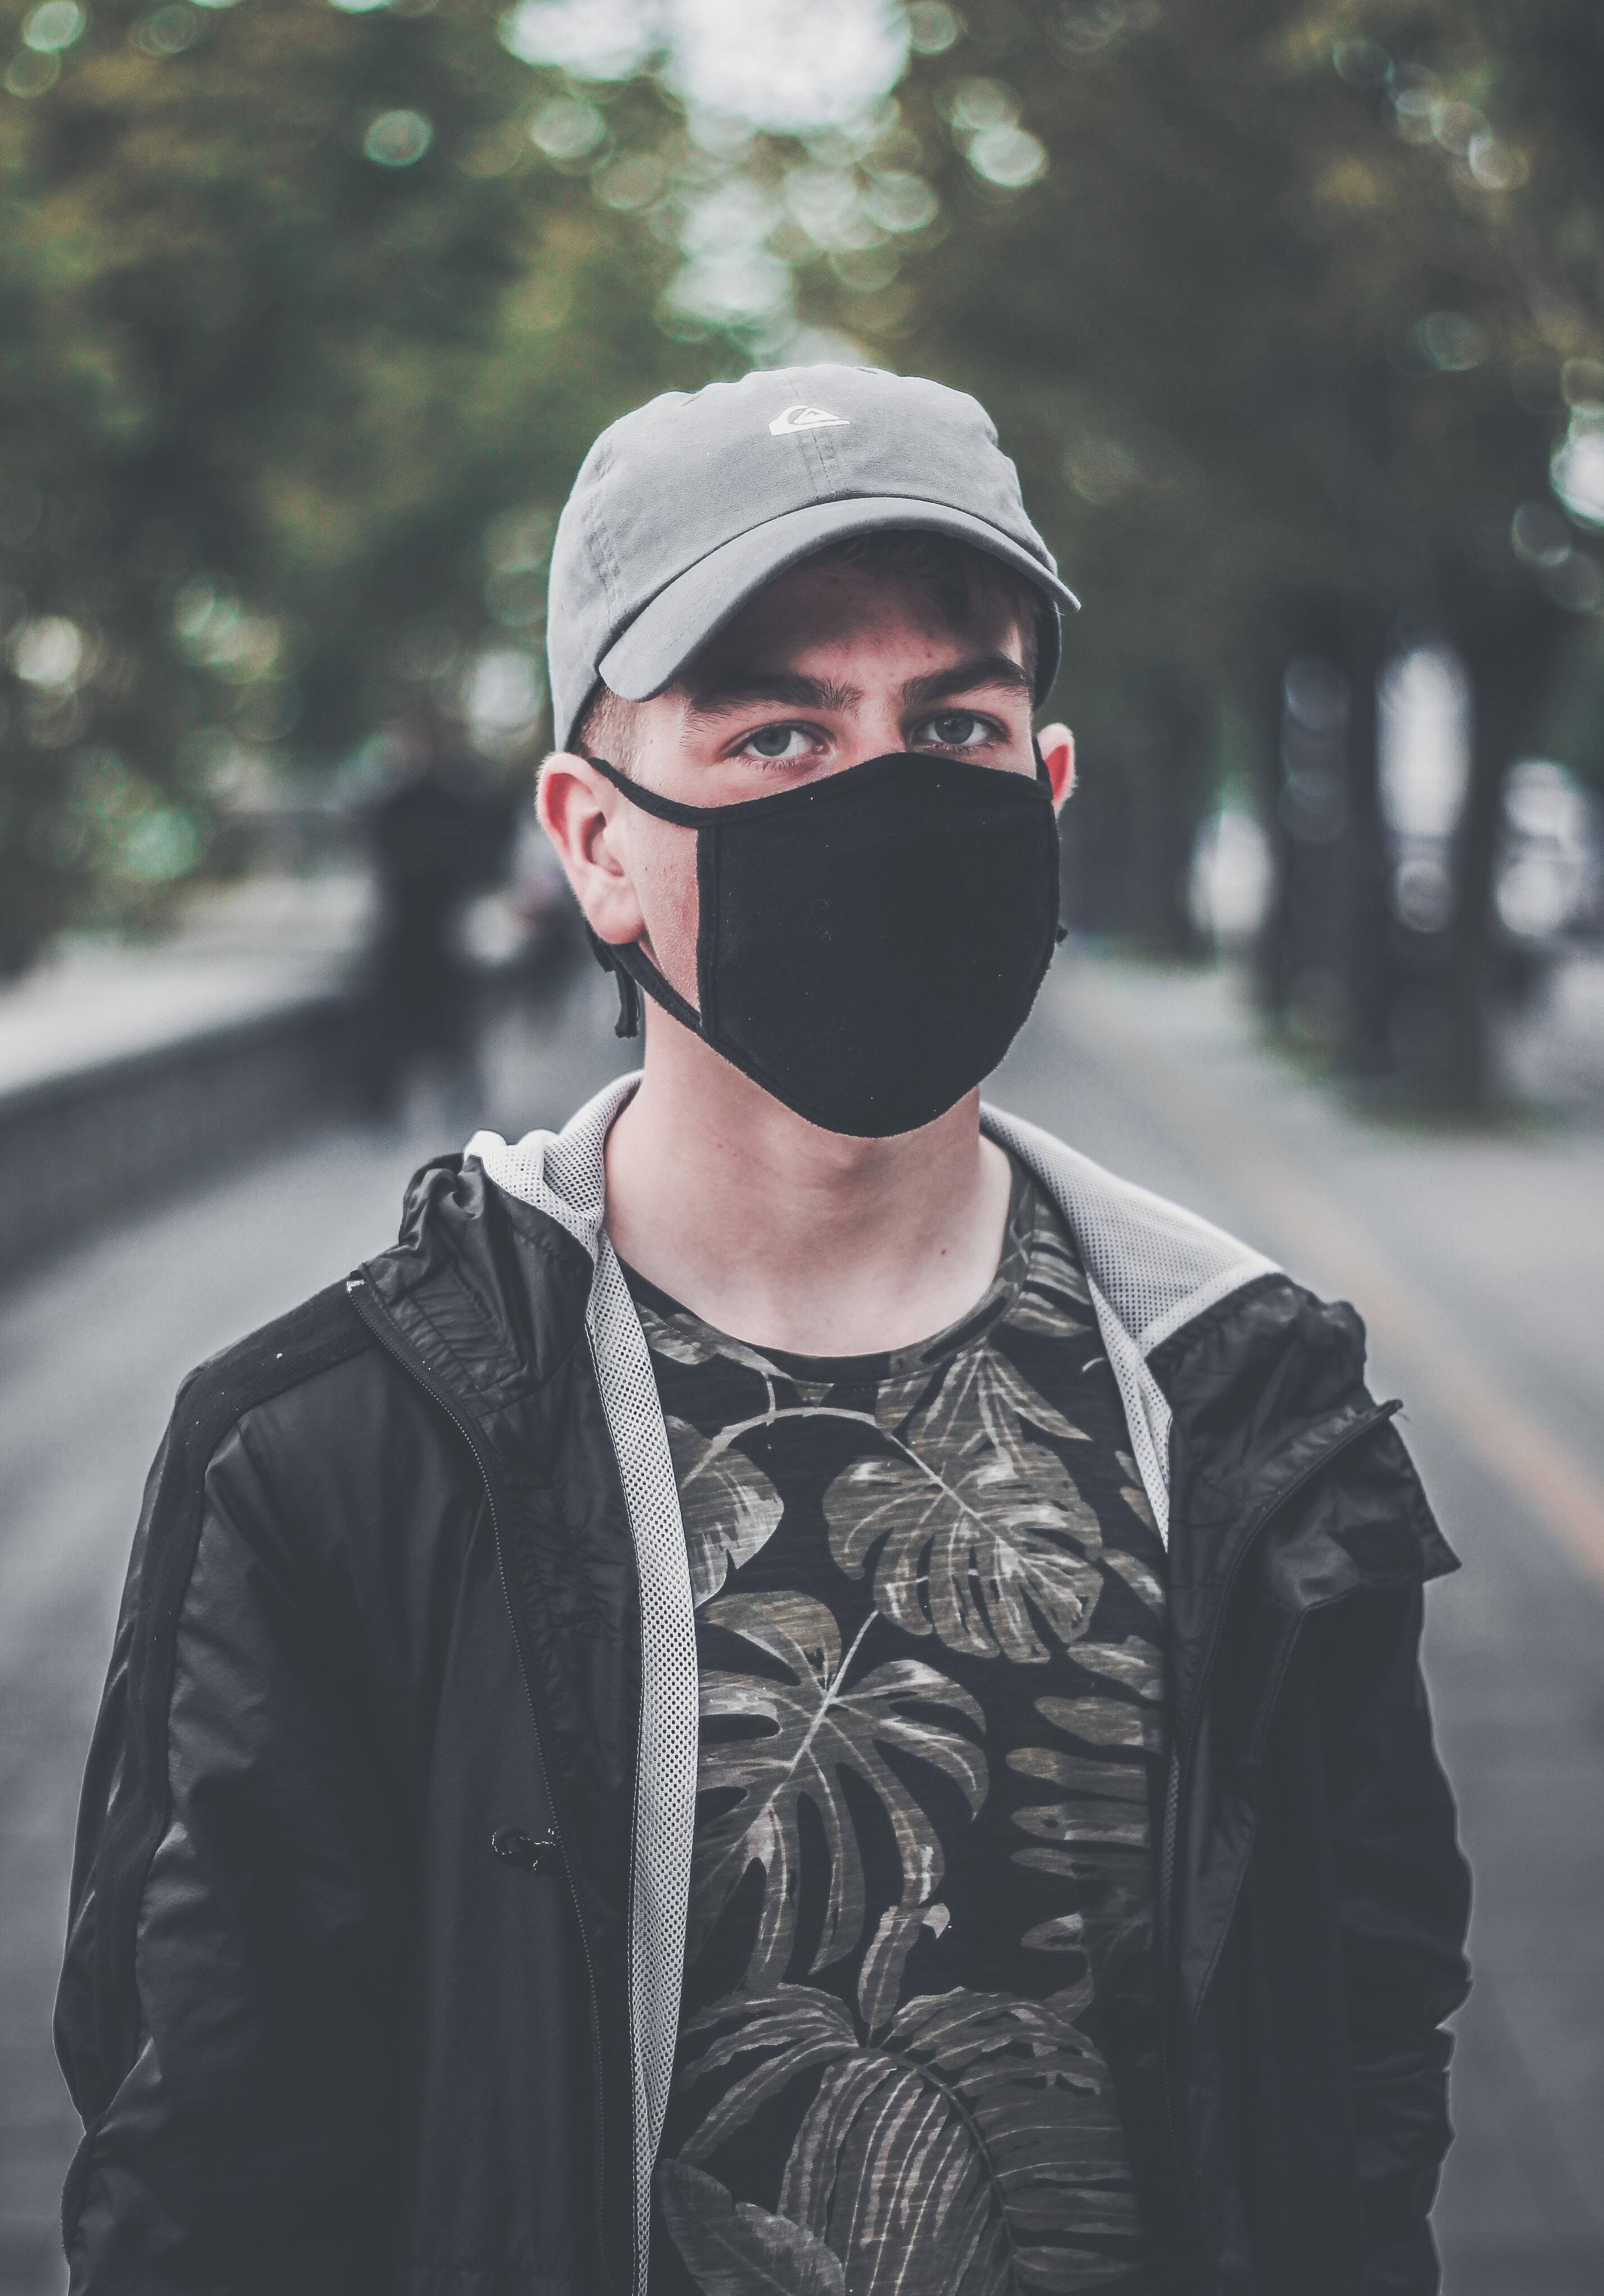 man wearing black face mask on park during daytime